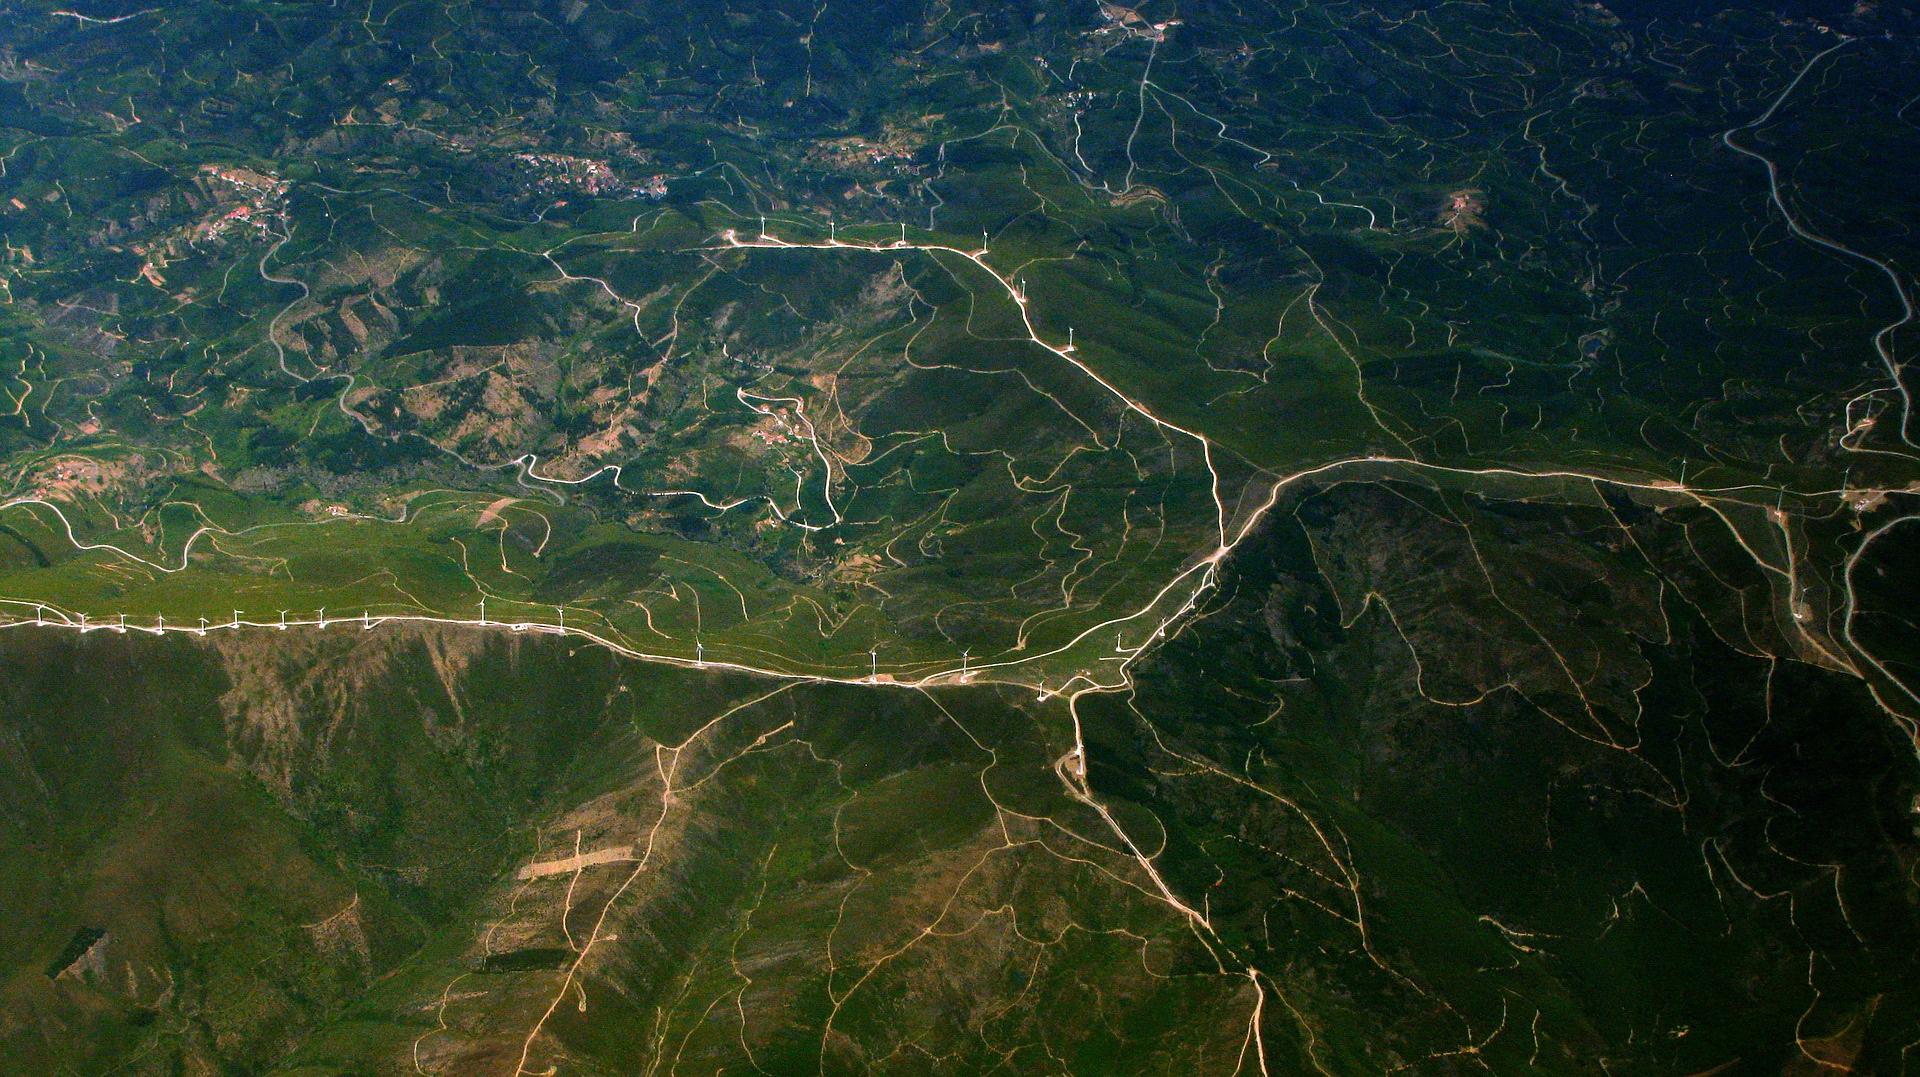 Indigenous resiliency through renewable energy